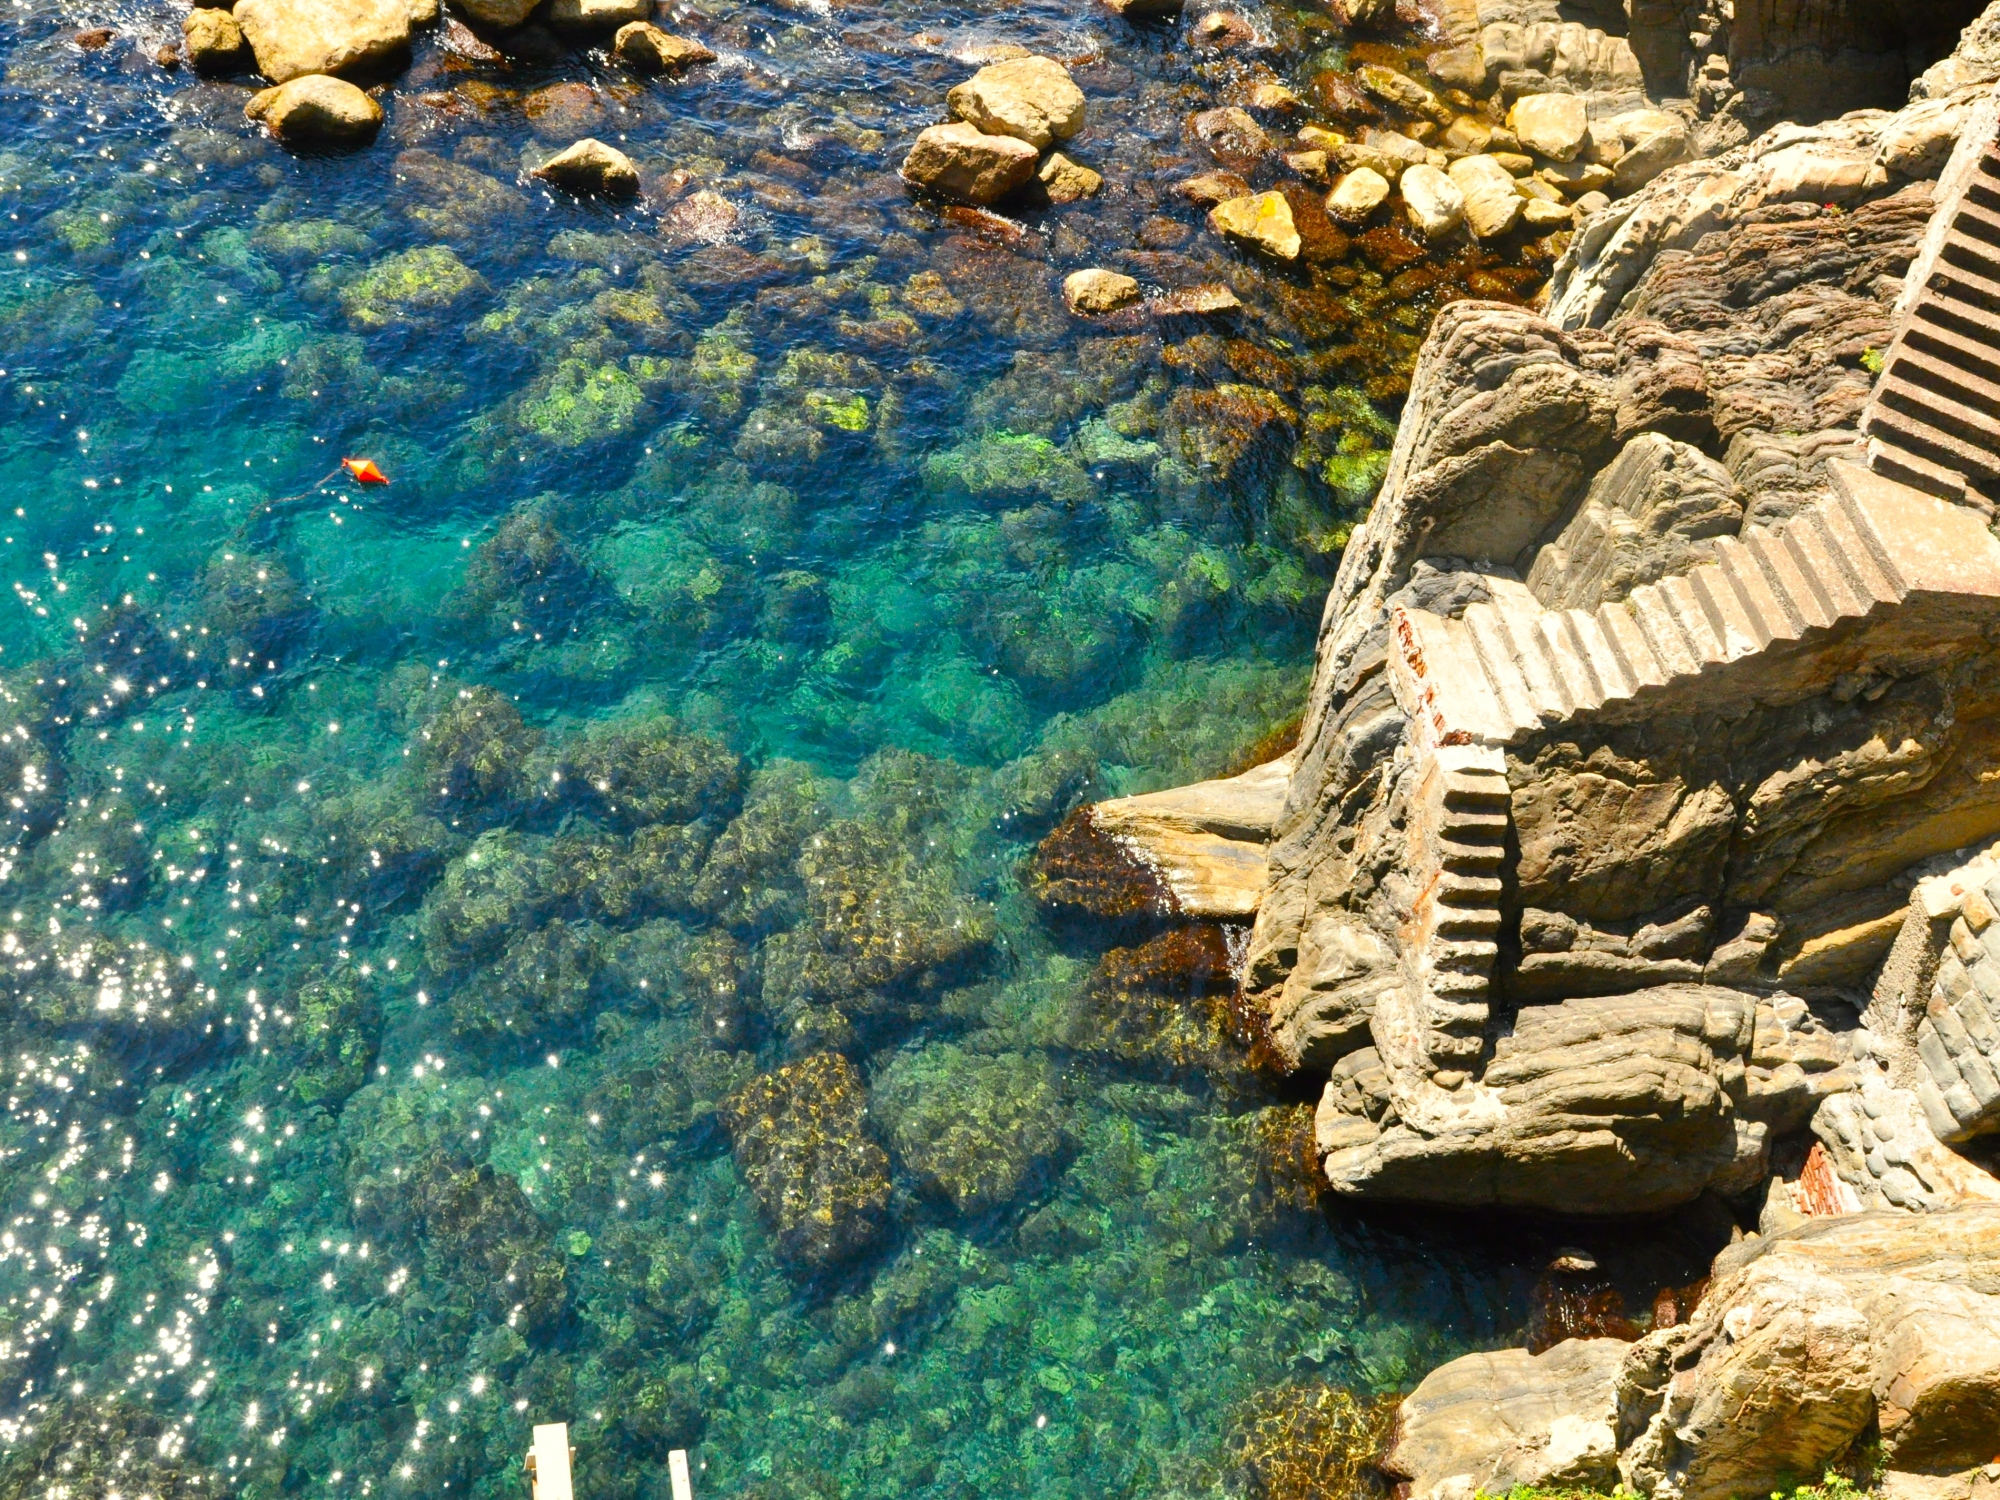 Photo Credit: Madi Goodrich Photography - Cinque Terre Italy